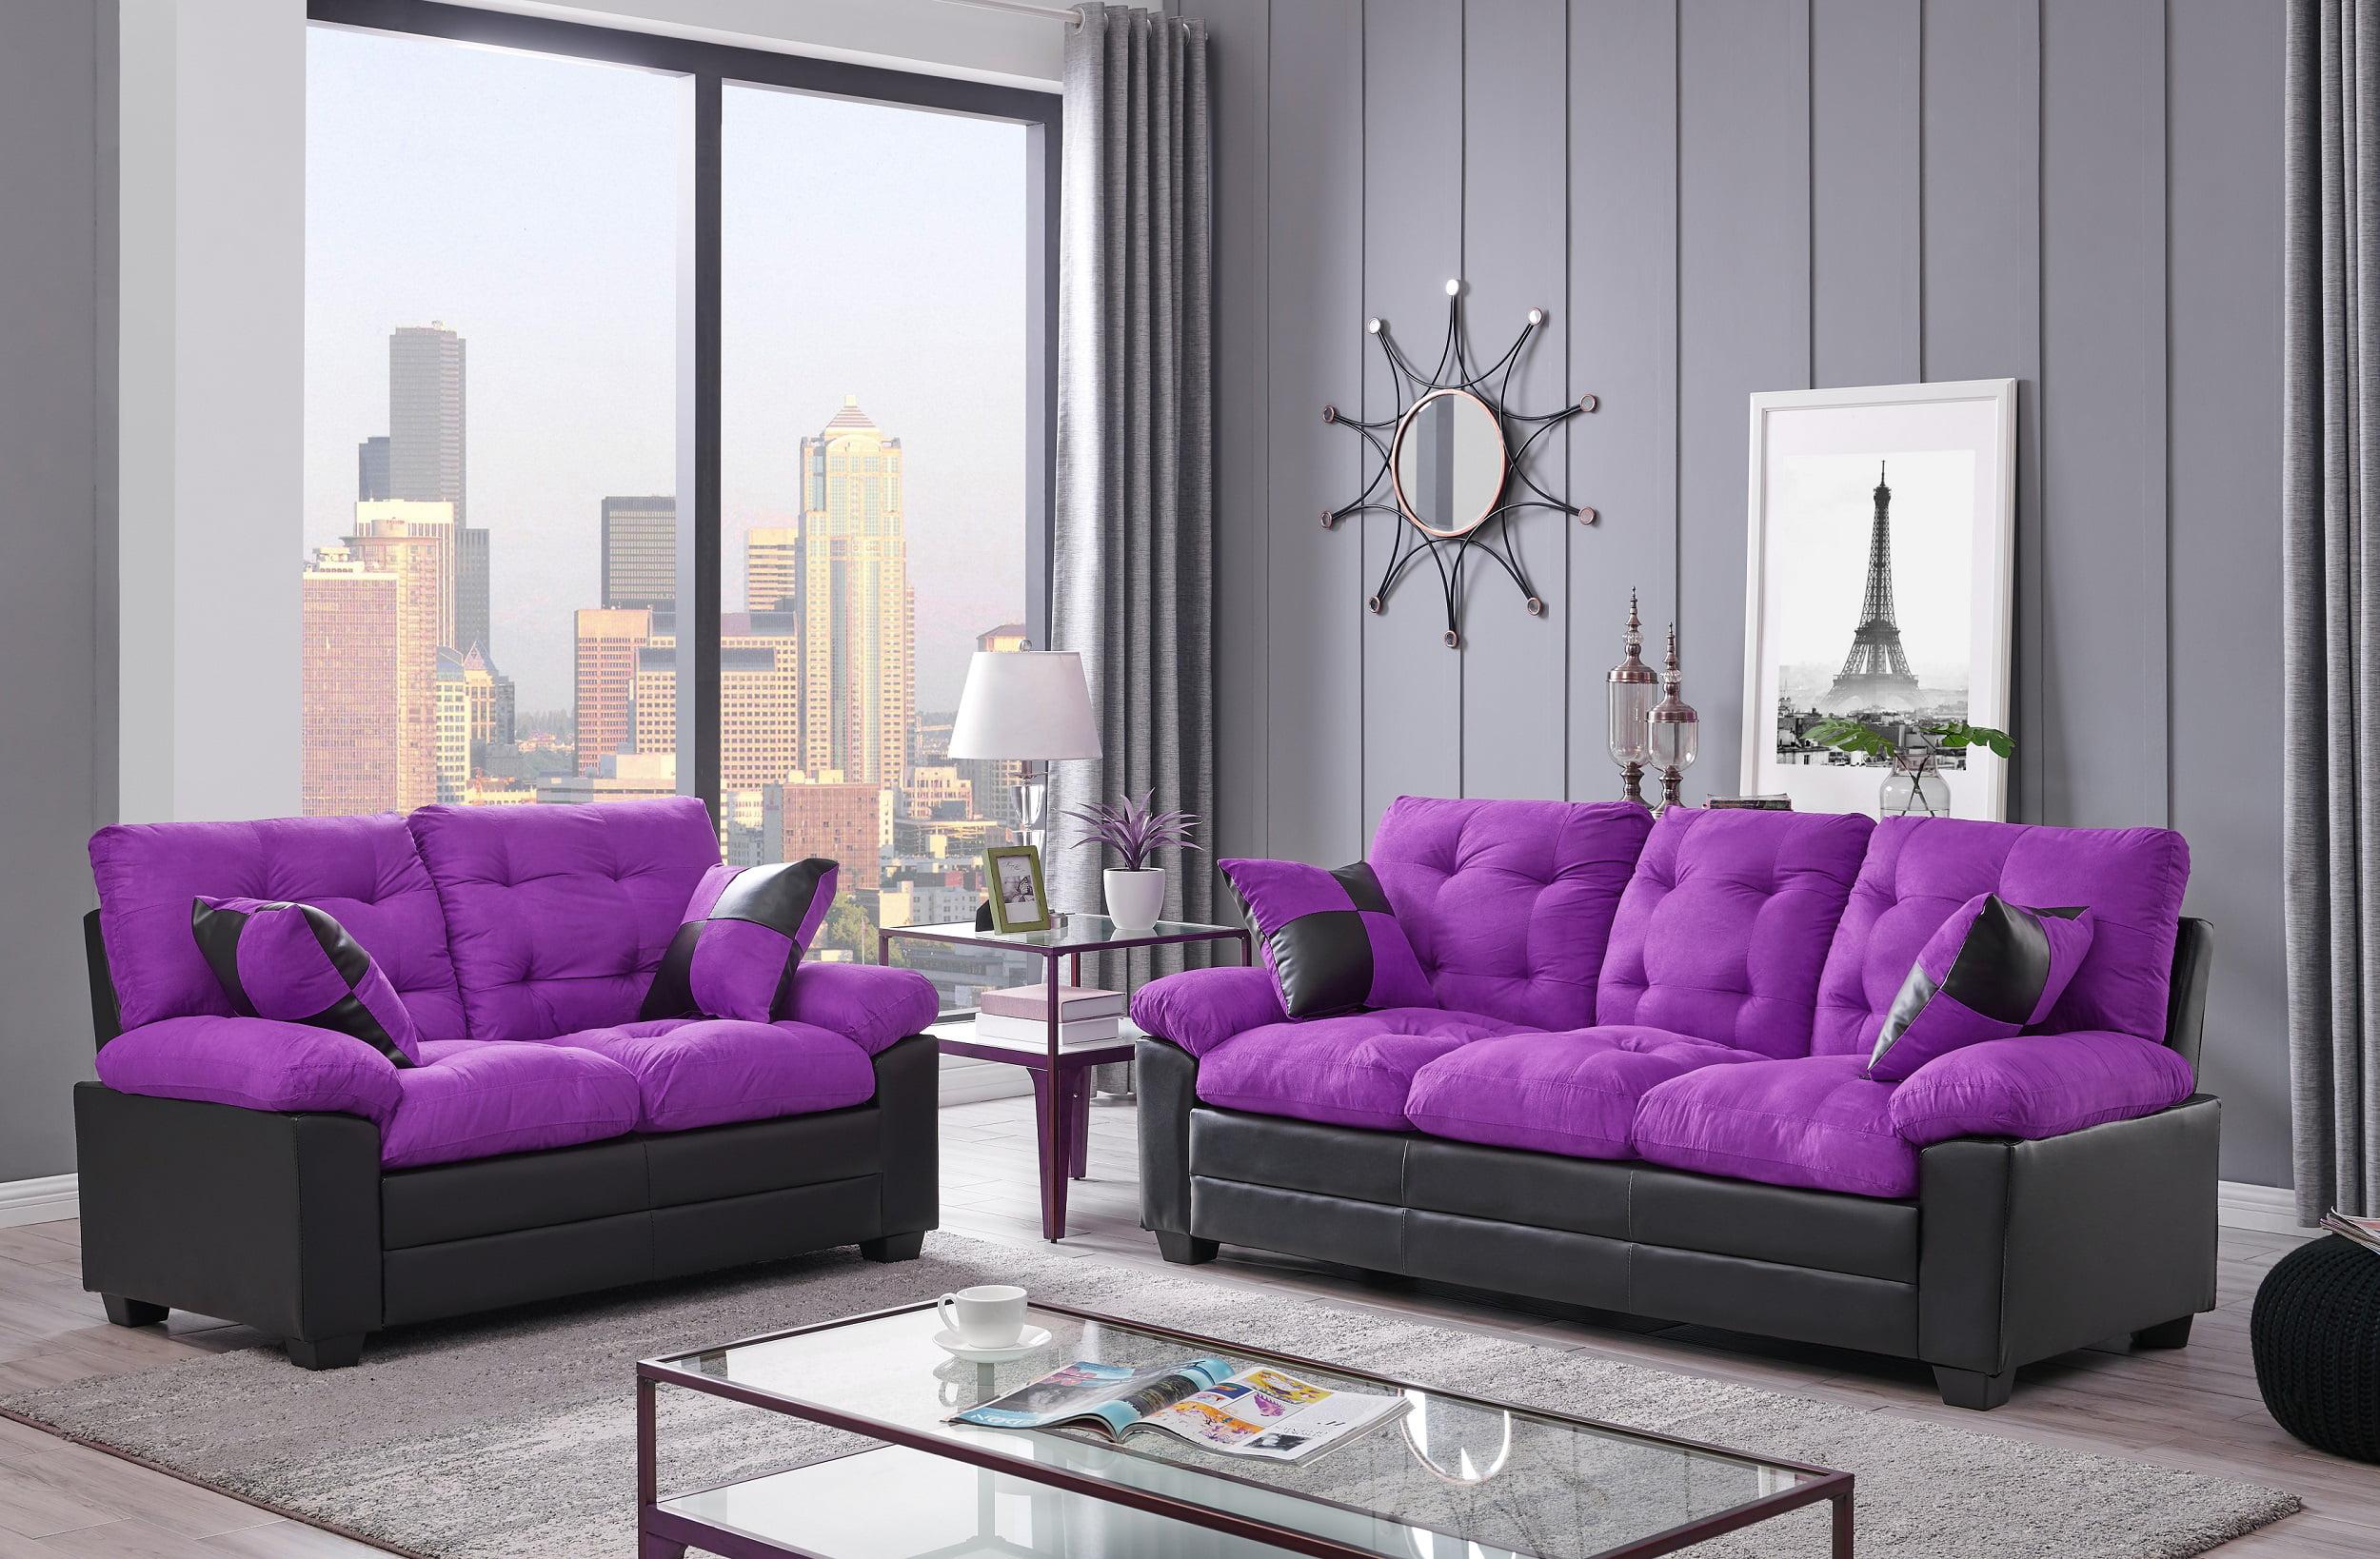 Living Room Simple Classic Plush Cushion Sofa And Loveseat Microfiber Upholstery Furniture Couch 2pc Sofa Set Purple And Black Color Walmart Com Walmart Com